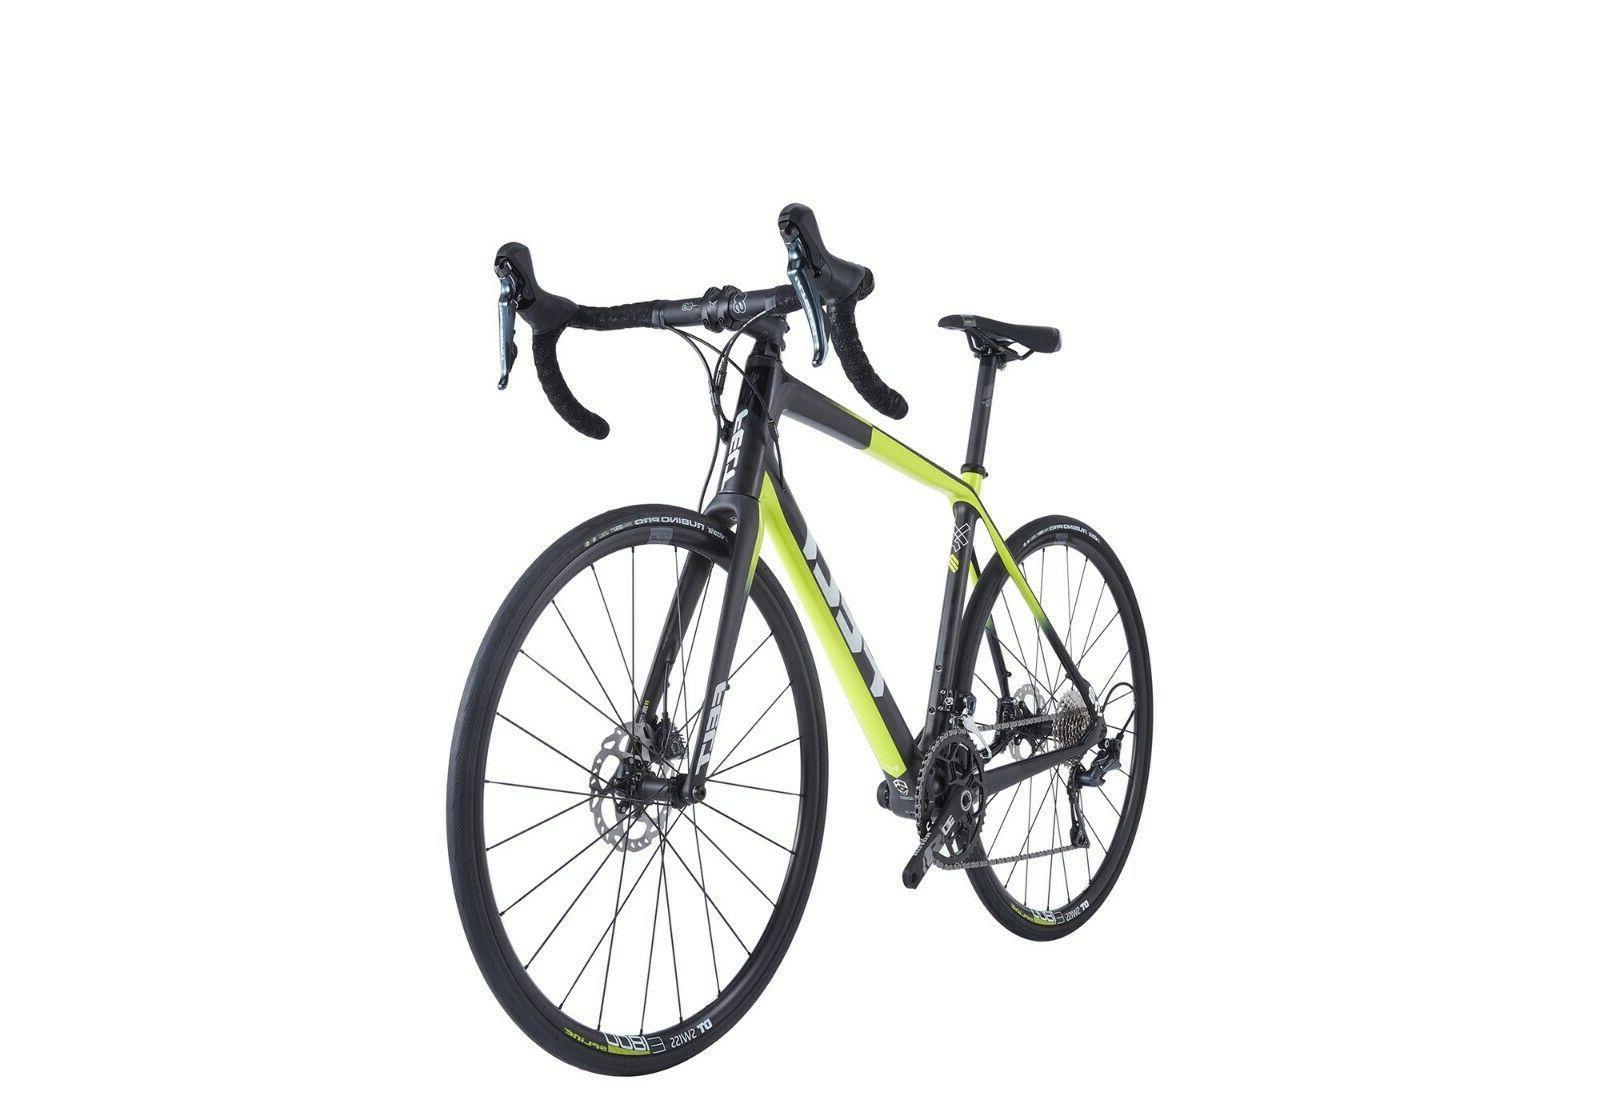 2018 Felt Fiber Road Bike